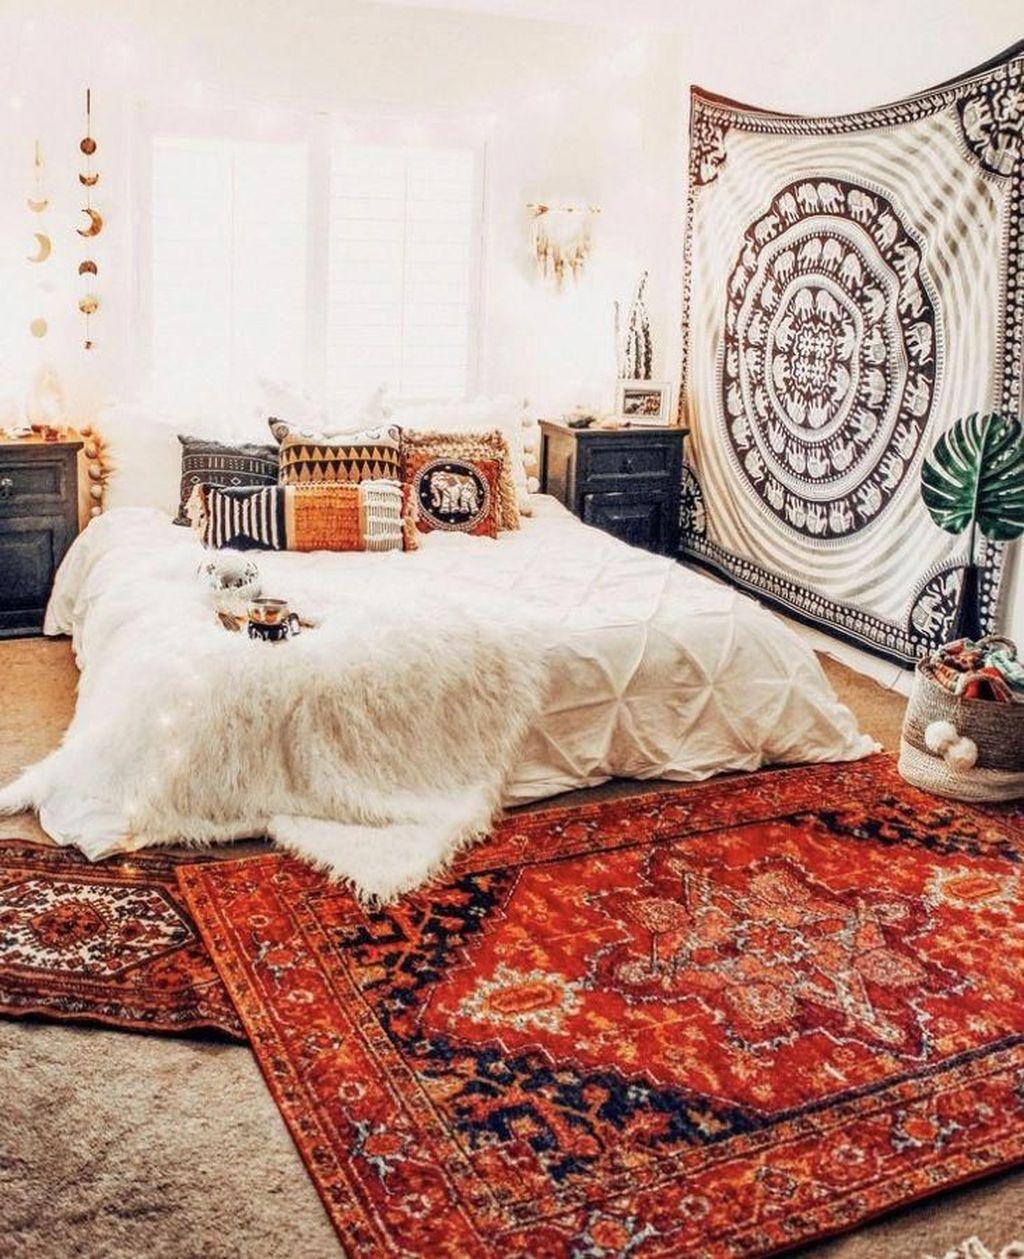 Awesome Boho Chic Bedroom Decor Ideas 13